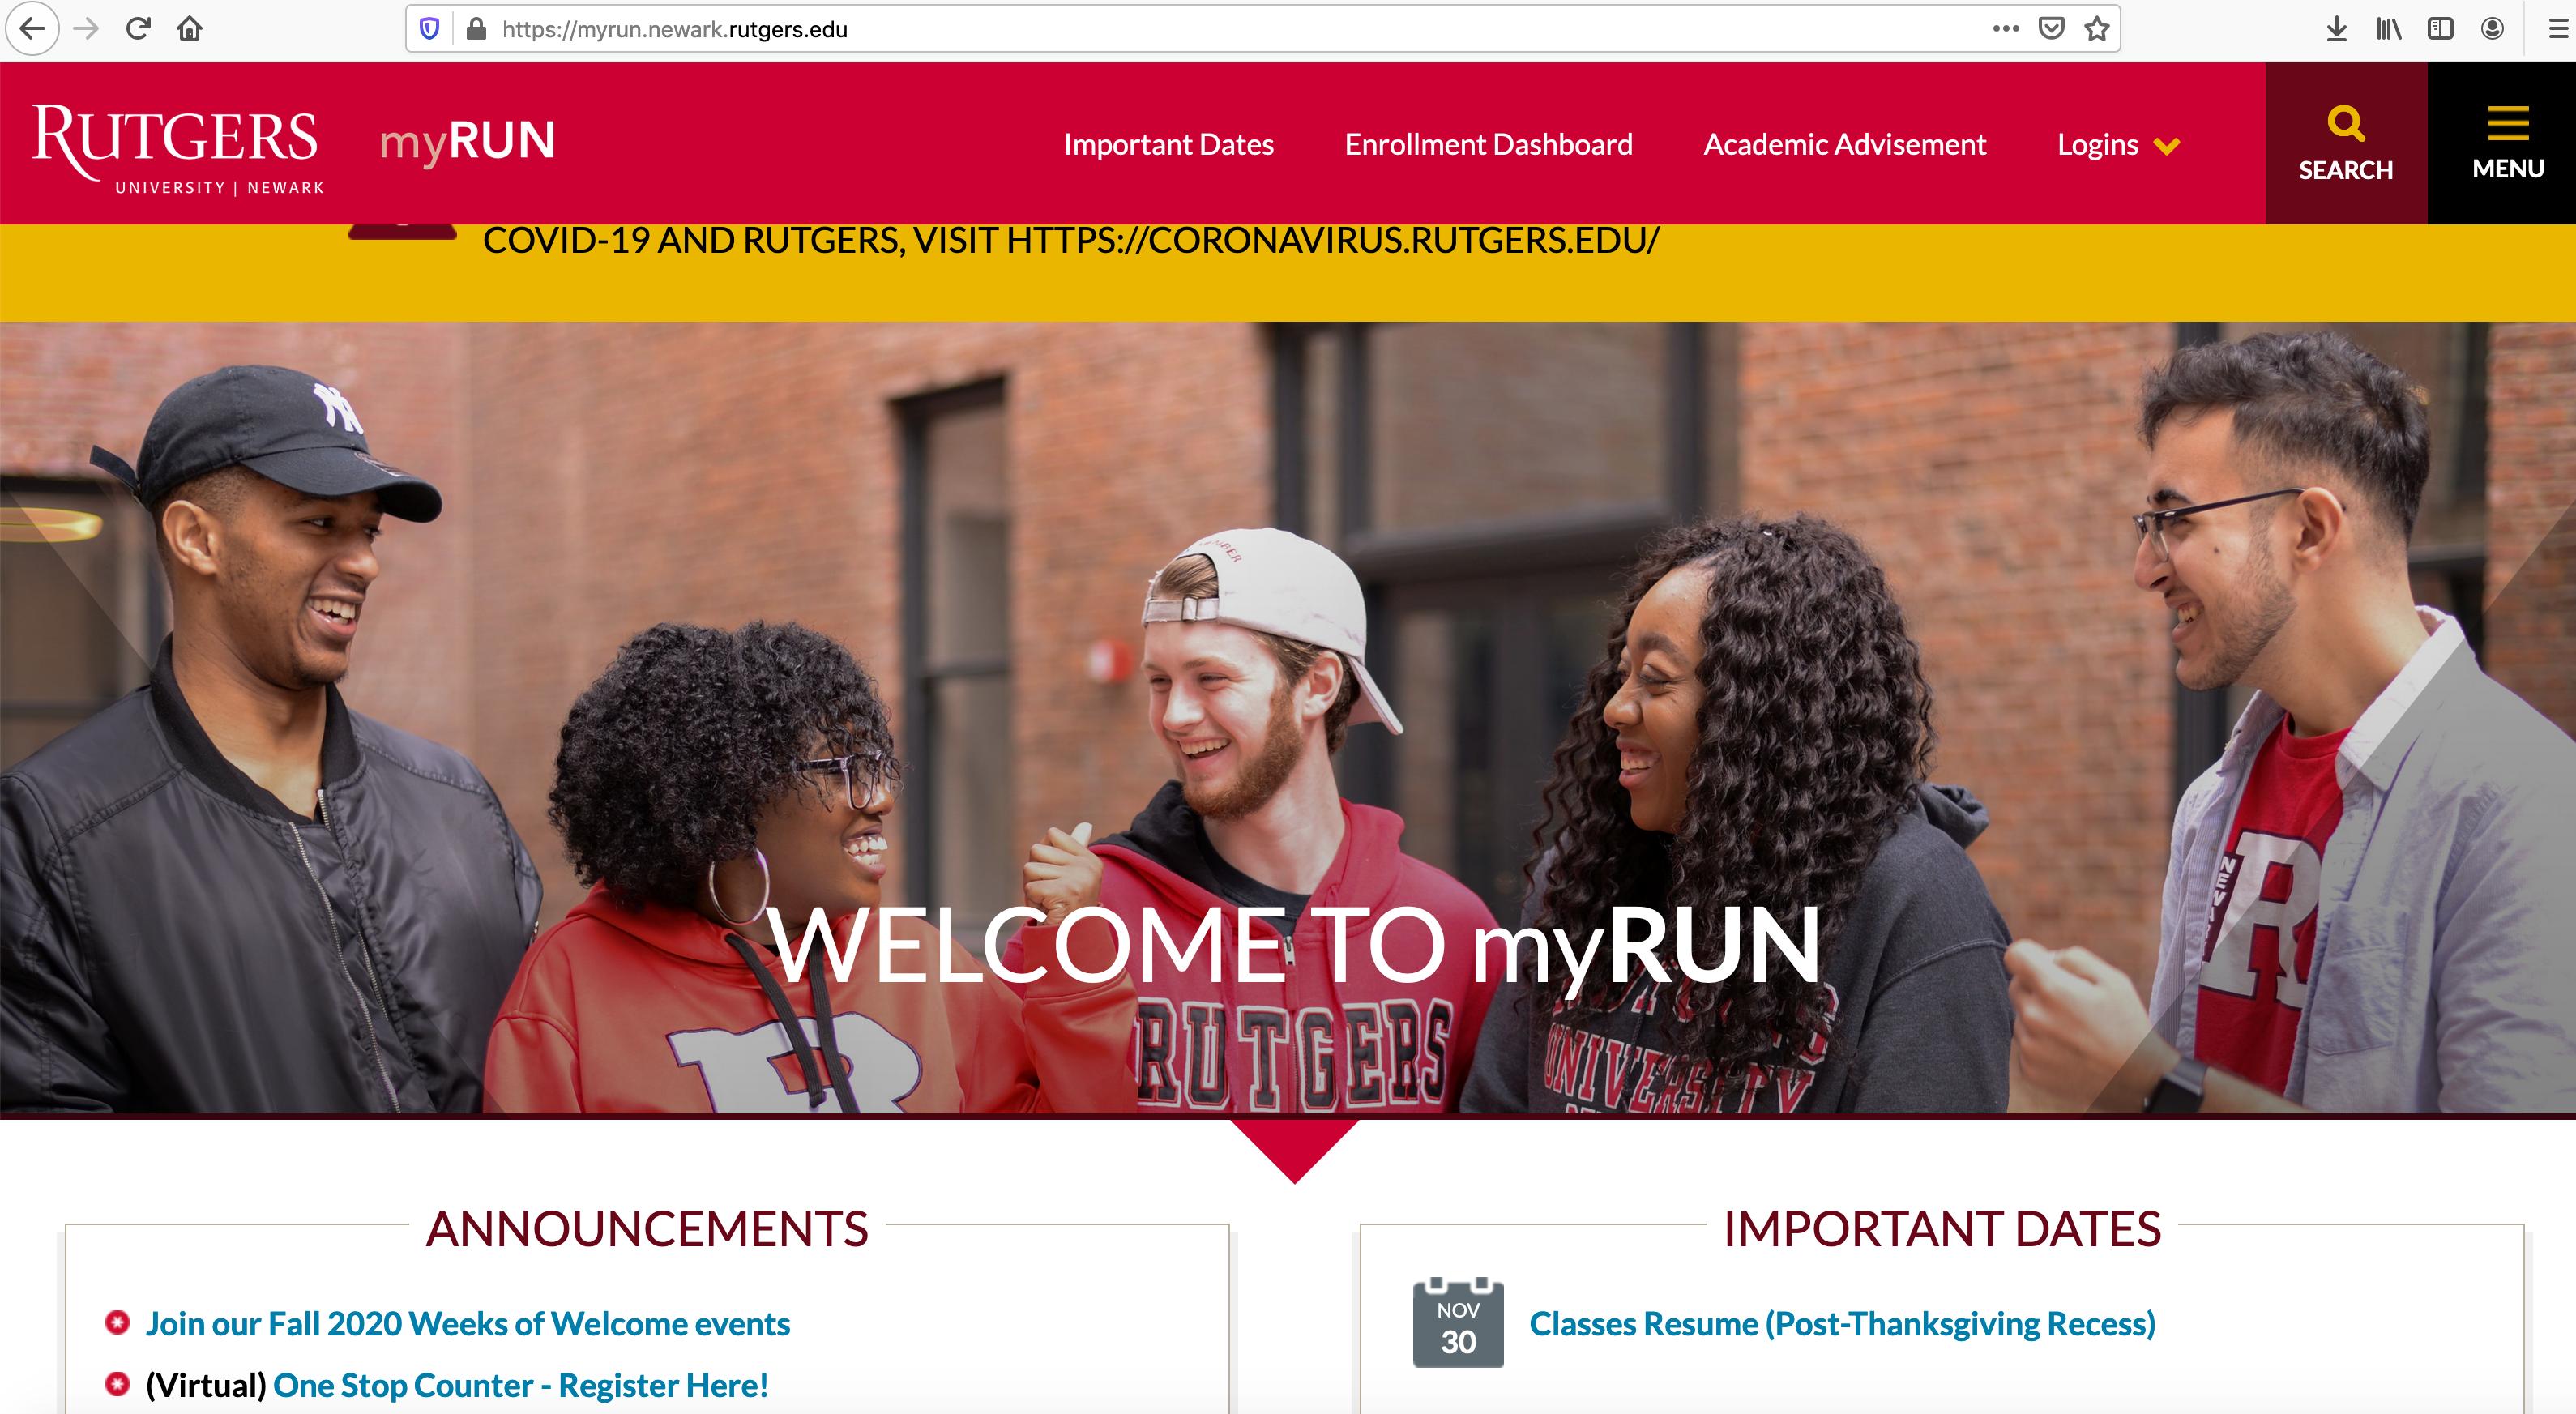 Rutgers Newark MYRUN Website Screenshot 2020